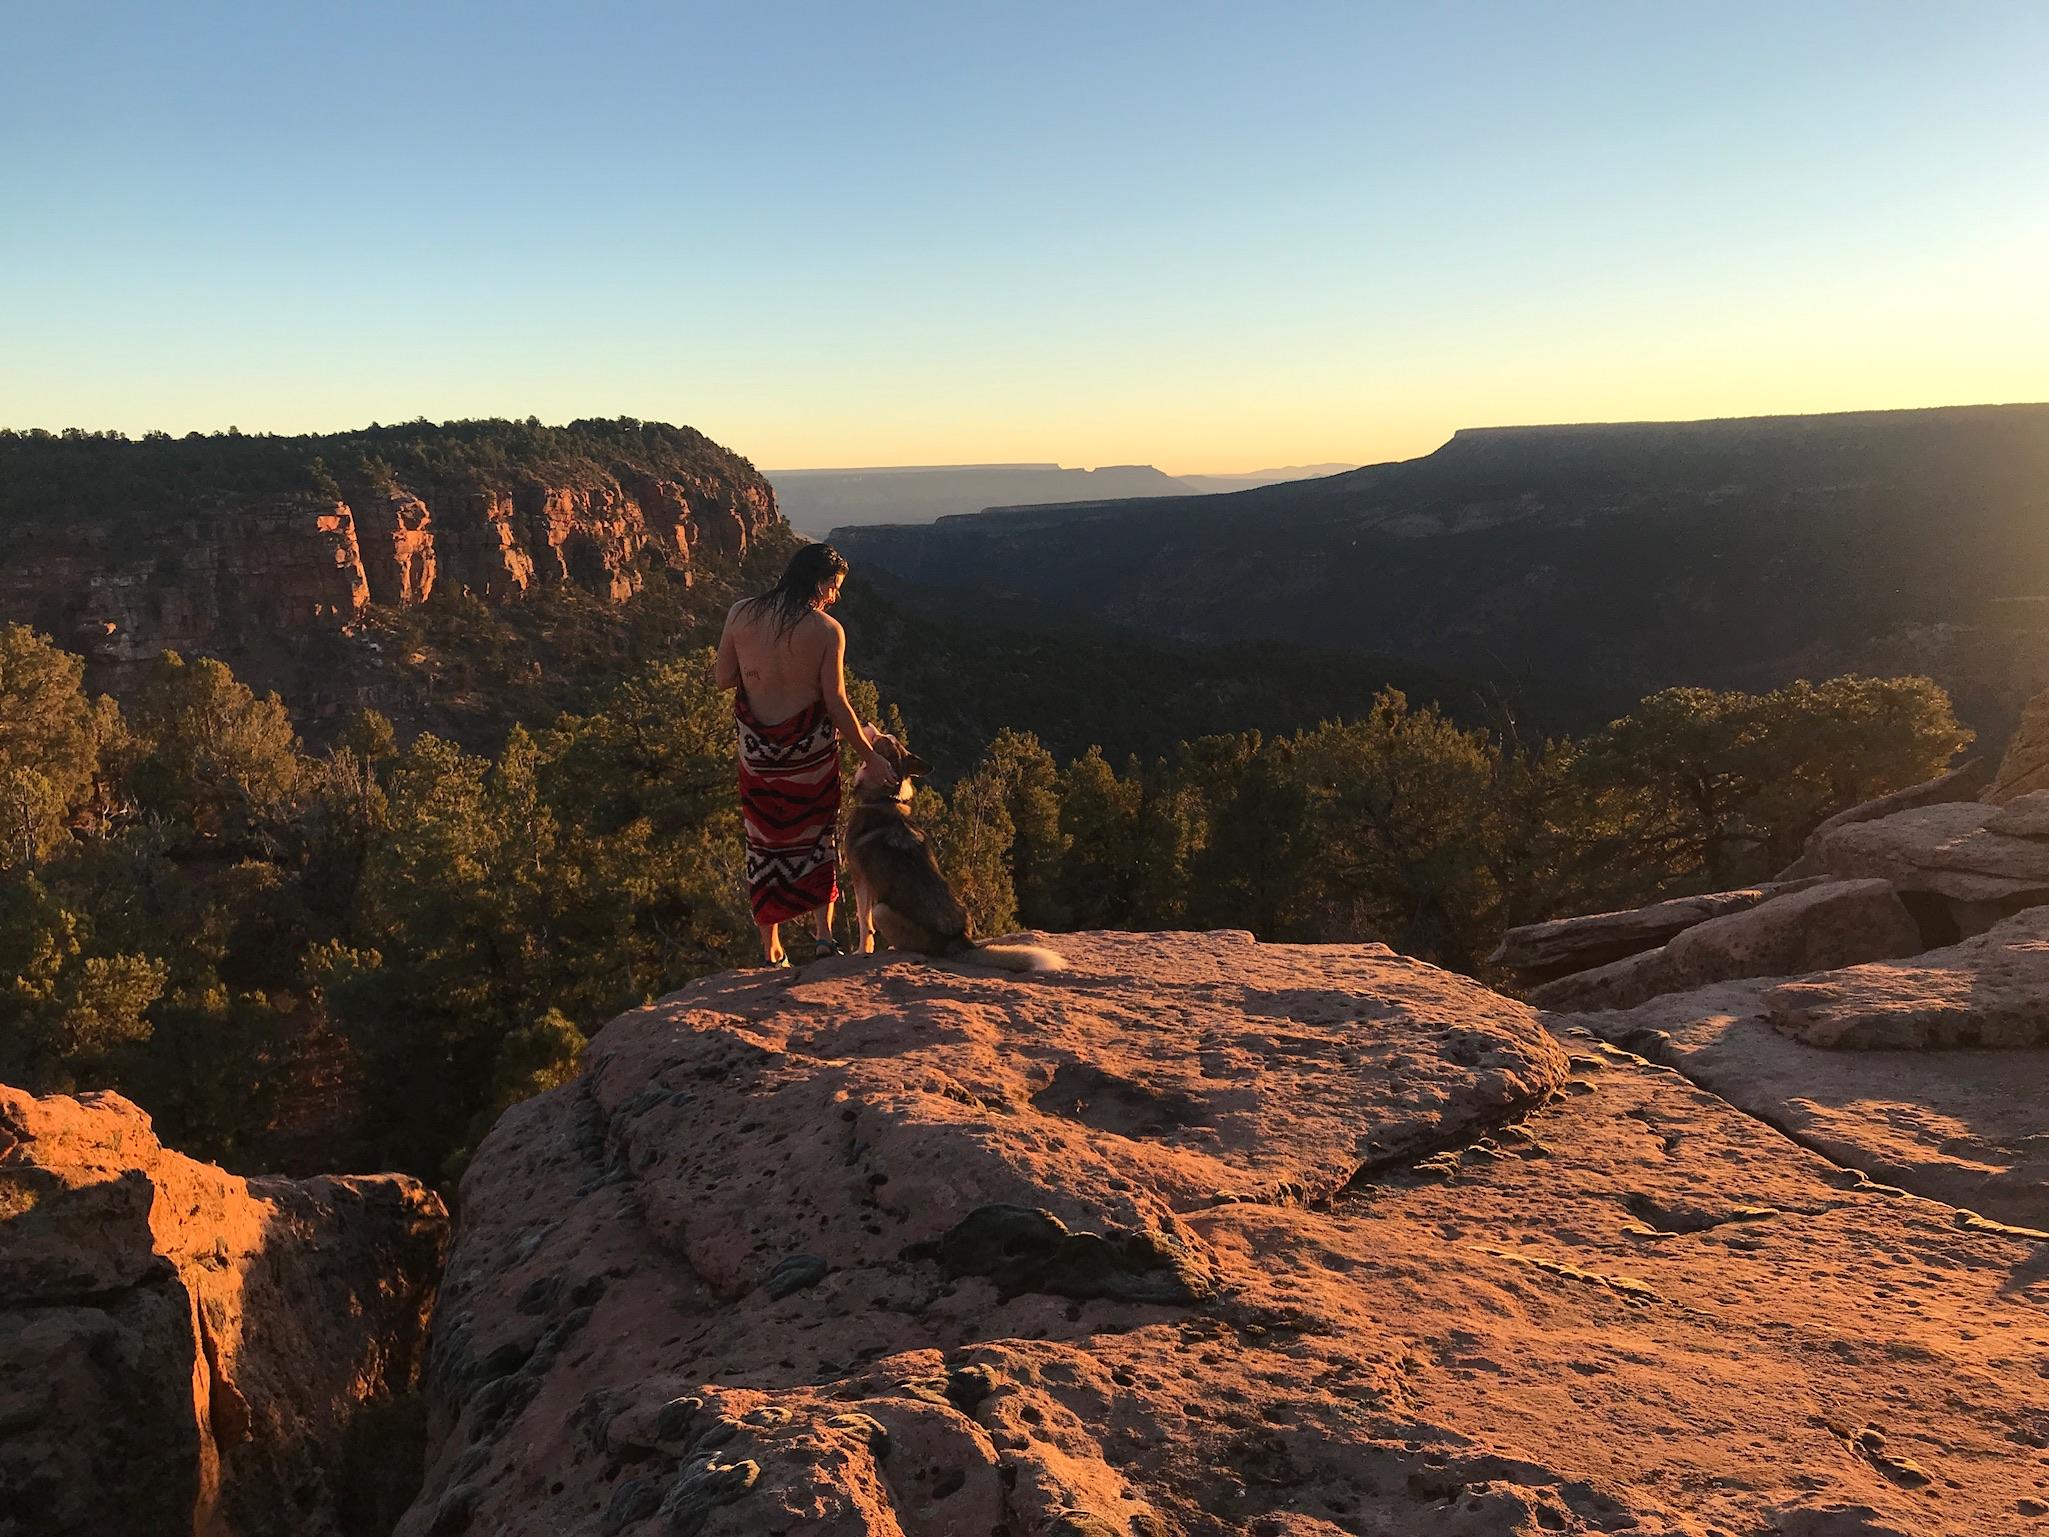 aaaand Sunset views